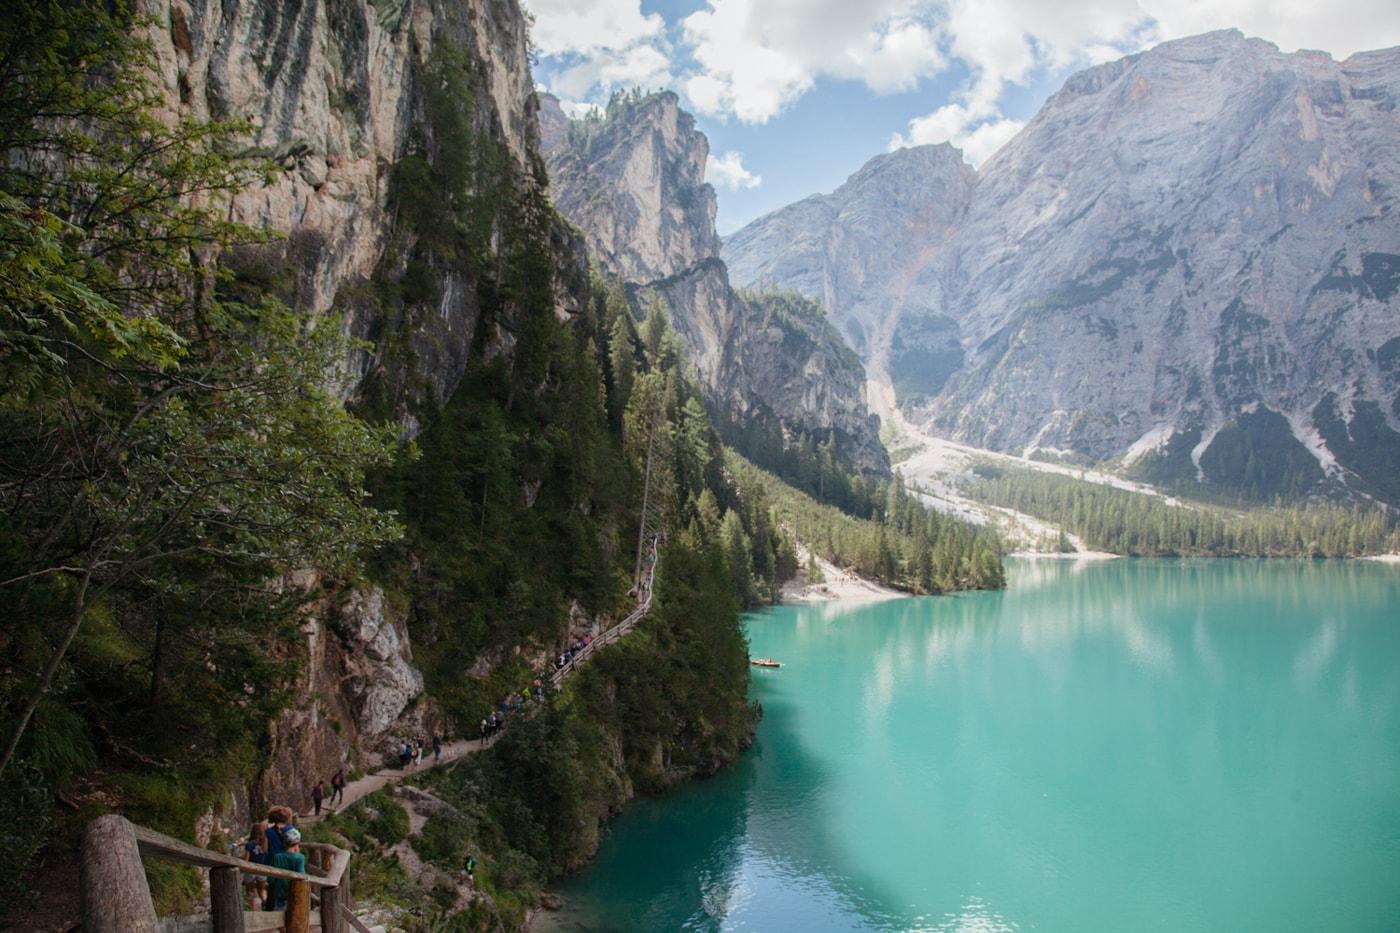 RAW SCTP0020-Emidi- Lake Braies, South Tyrol, Italy-20